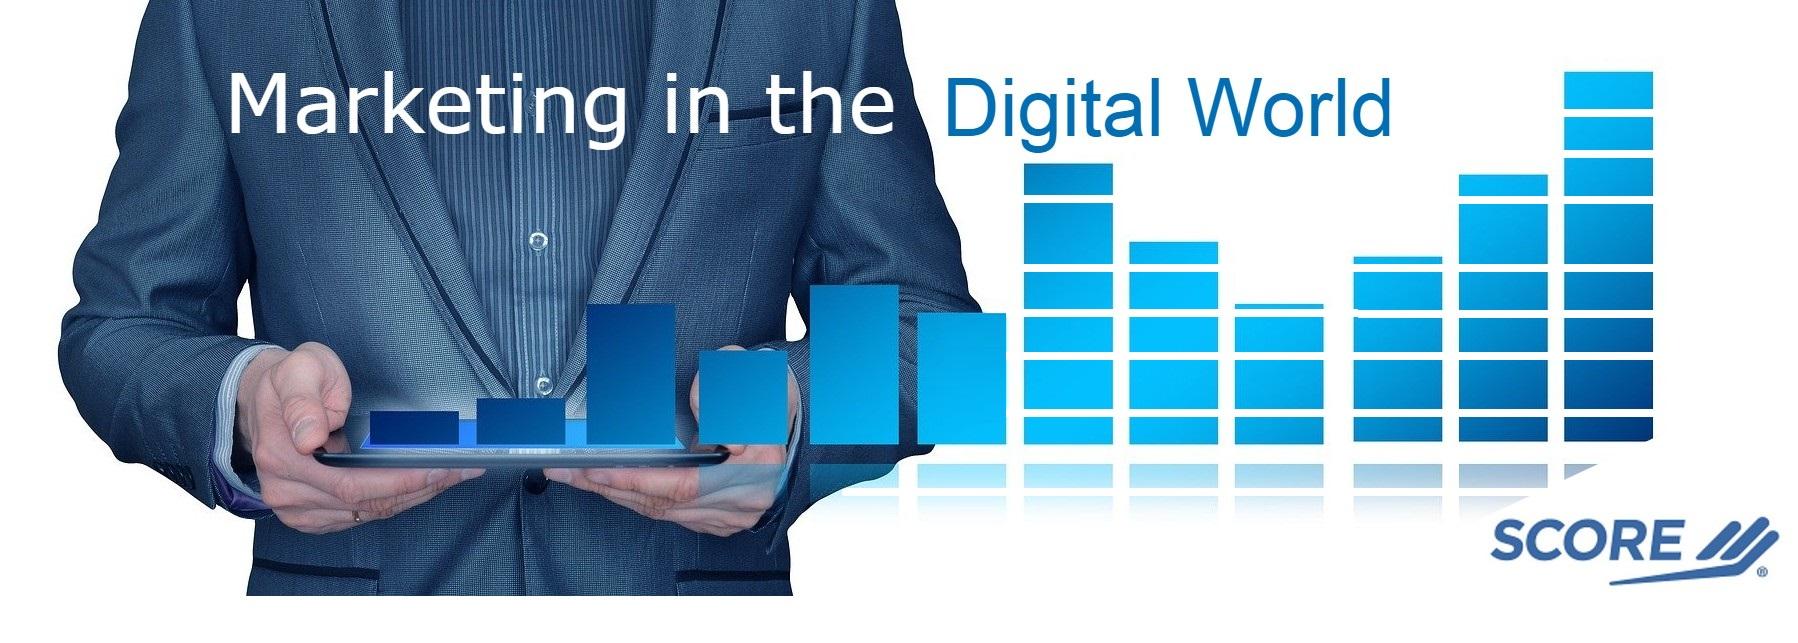 "SBA and SCORE Manasota Present ""Marketing in the Digital World"" Four Virtual Events"